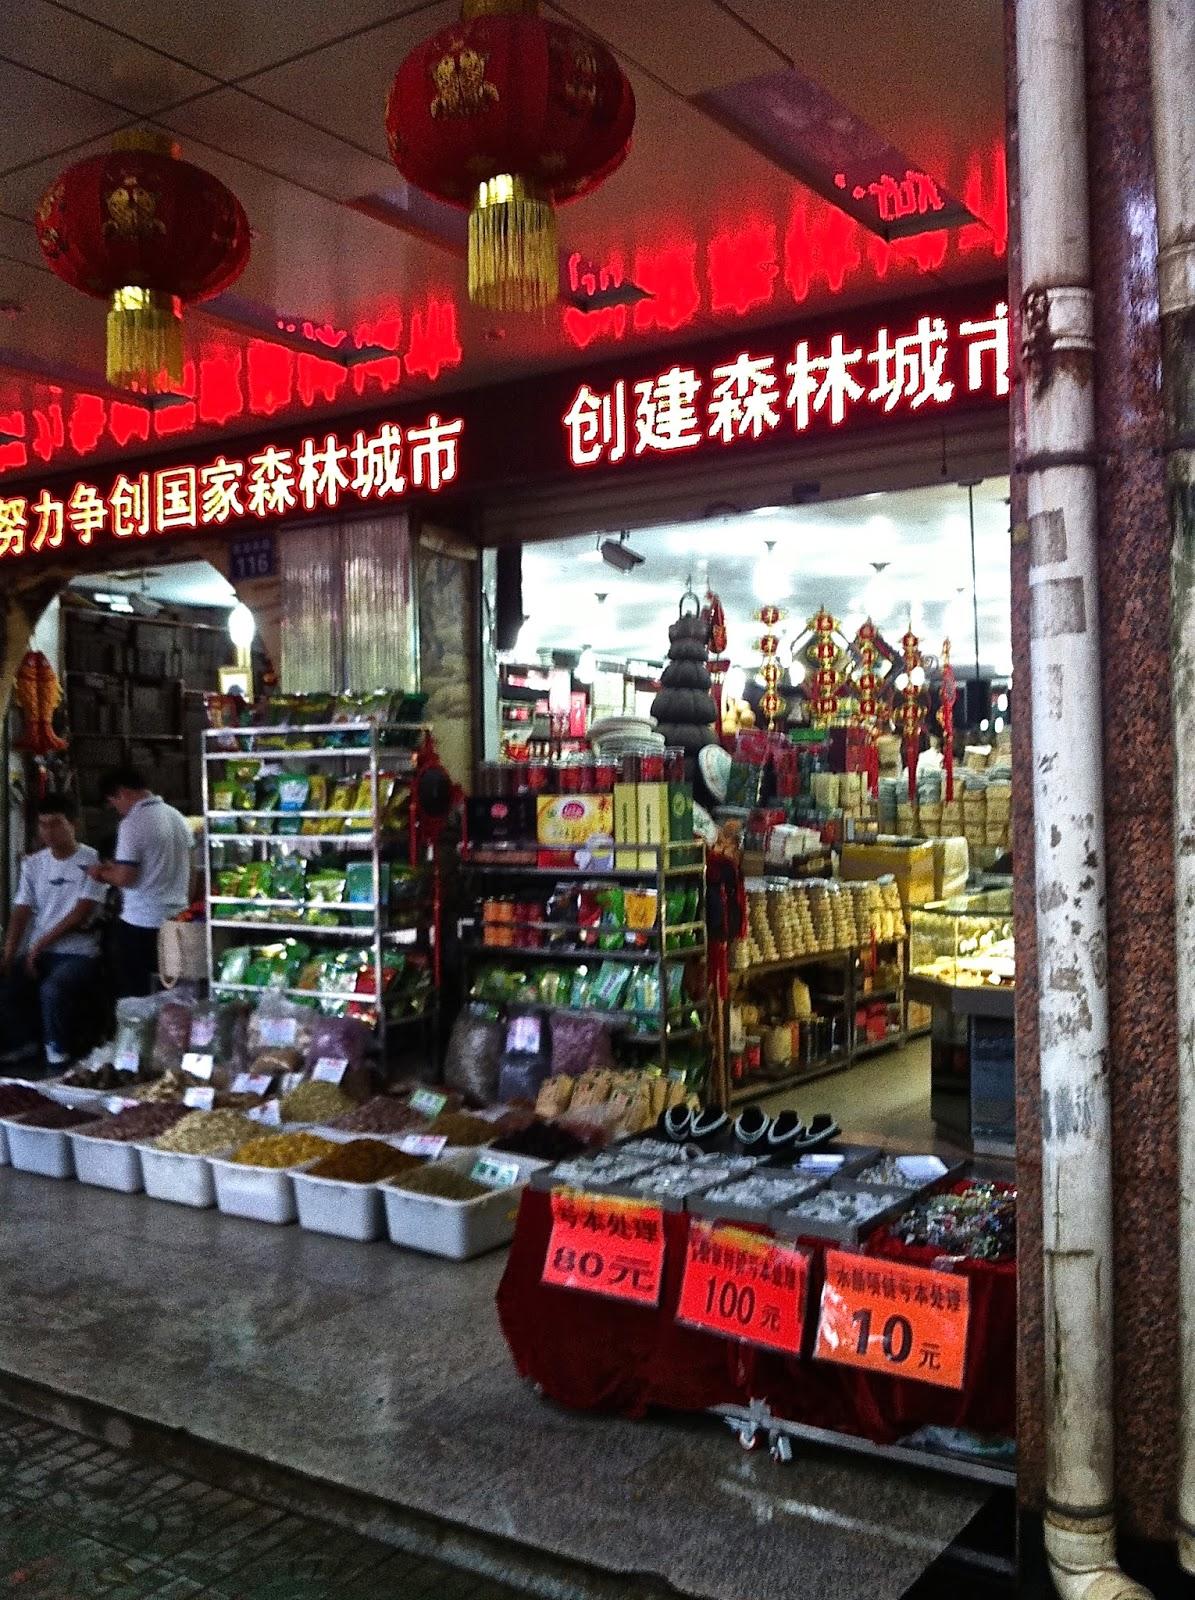 The outside of my favorite tea shop in Kunming.